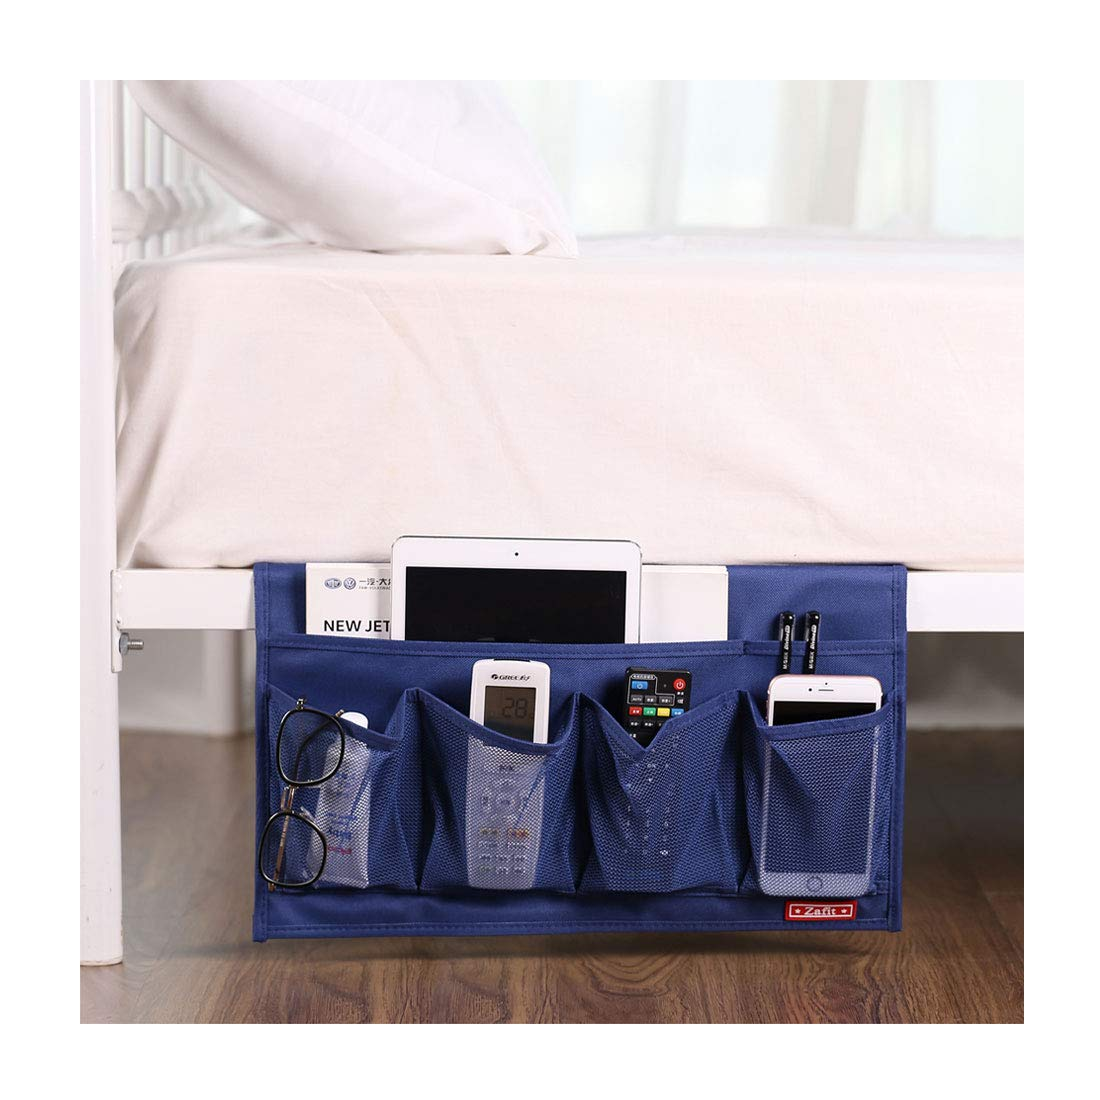 Zafit 6 Pockets Bedside Storage Organizer, Table cabinet Storage Organizer Bedside Organizer Caddy for Remotes Phone Glasses (Black) Zafitbd008